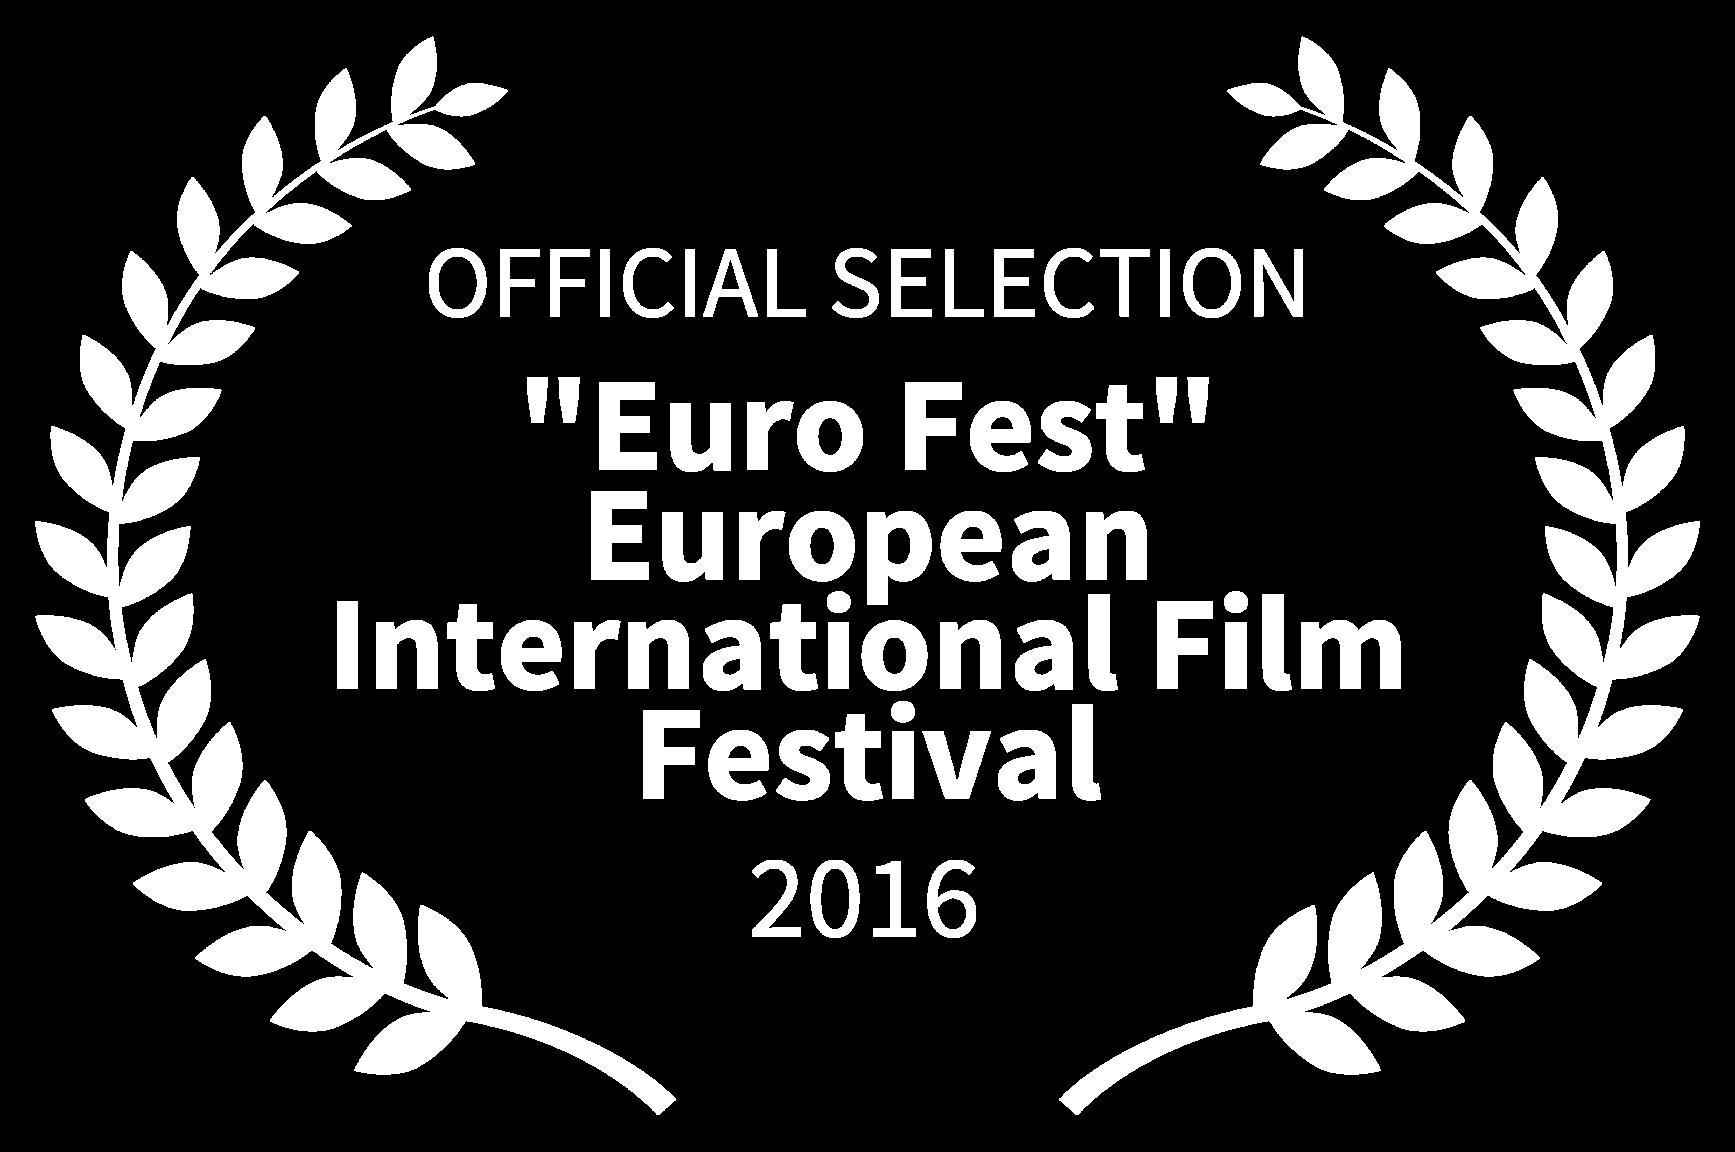 OFFICIAL SELECTION - Euro Fest European International Film Festival - 2016